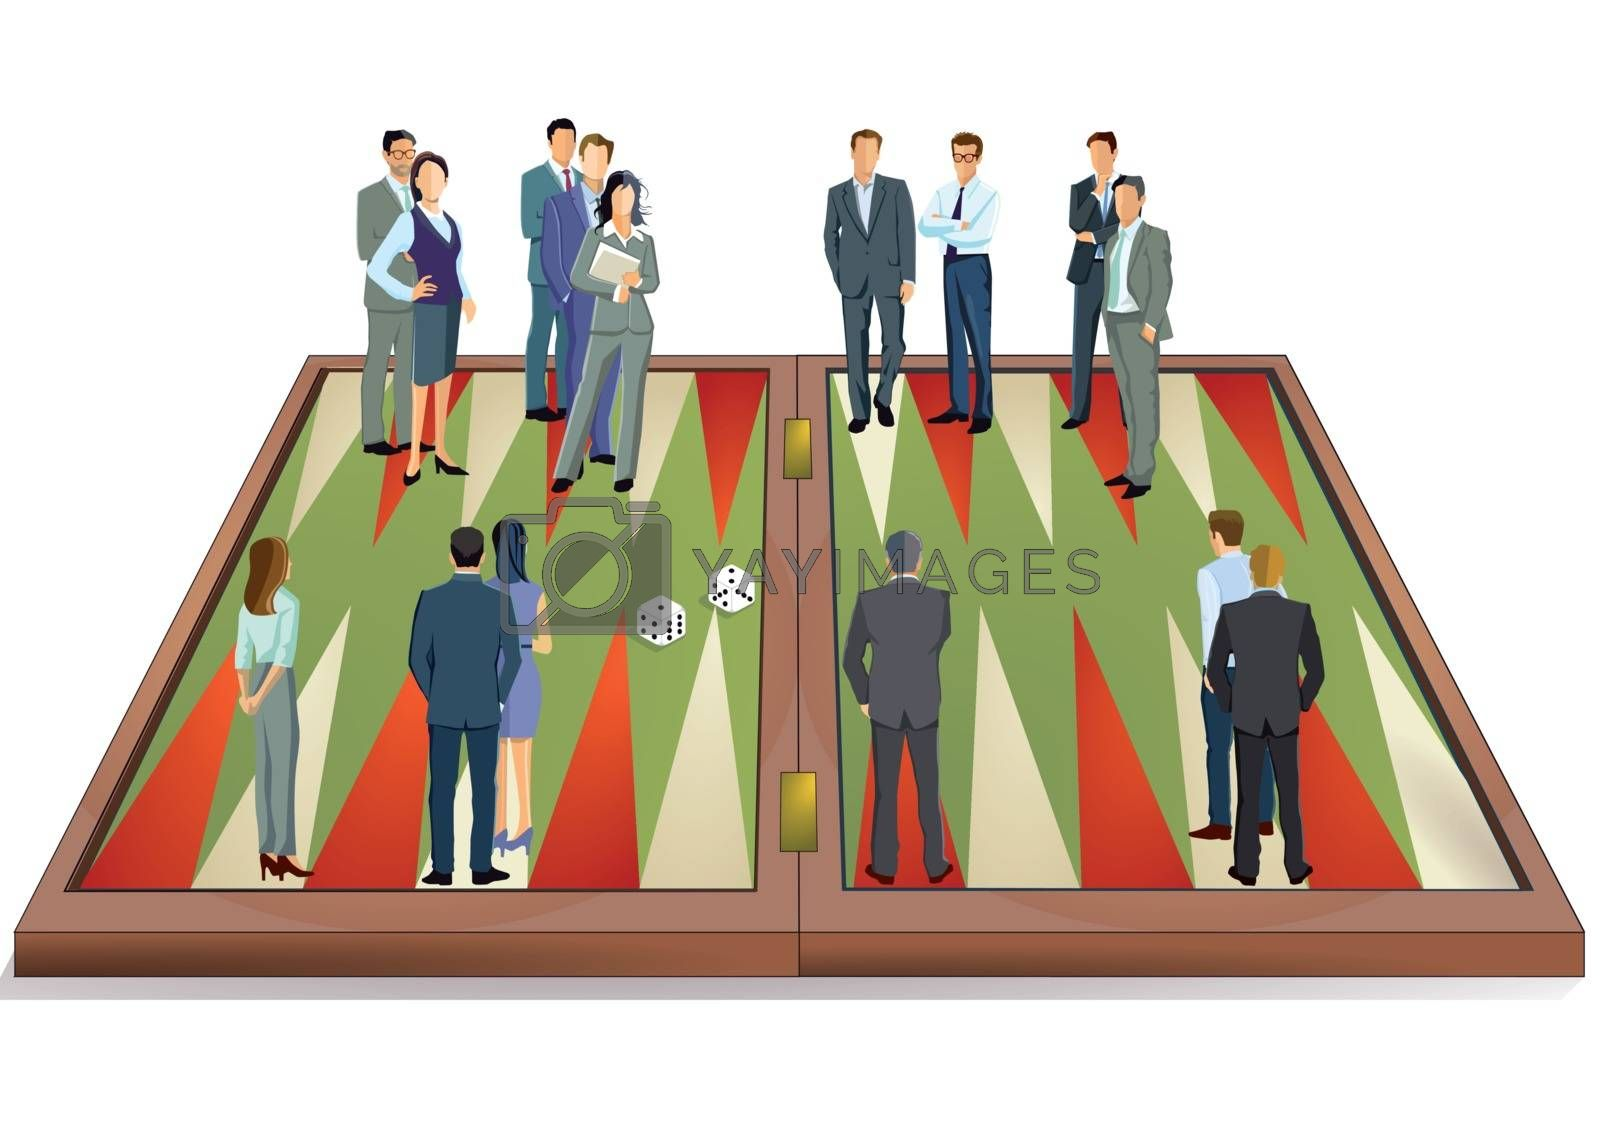 Backgammon game concept, illustration